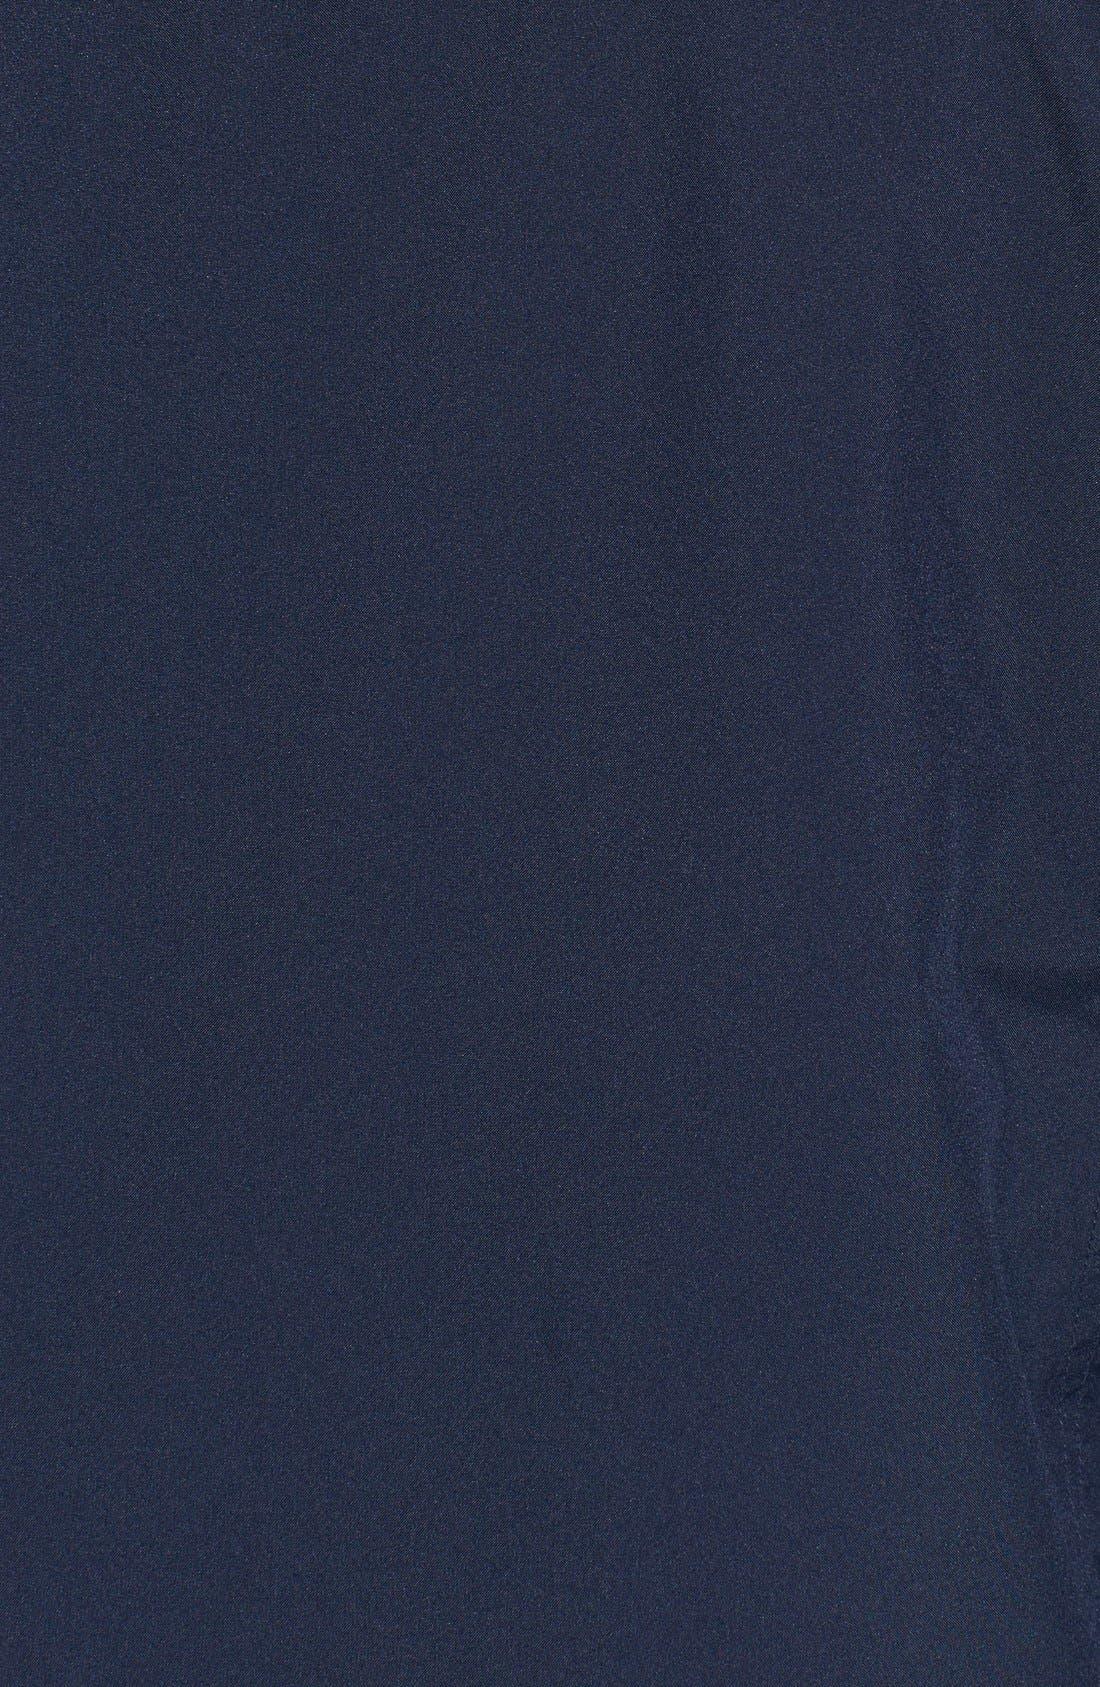 Alternate Image 3  - Cutter & Buck WeatherTec Sanders Jacket (Big & Tall)